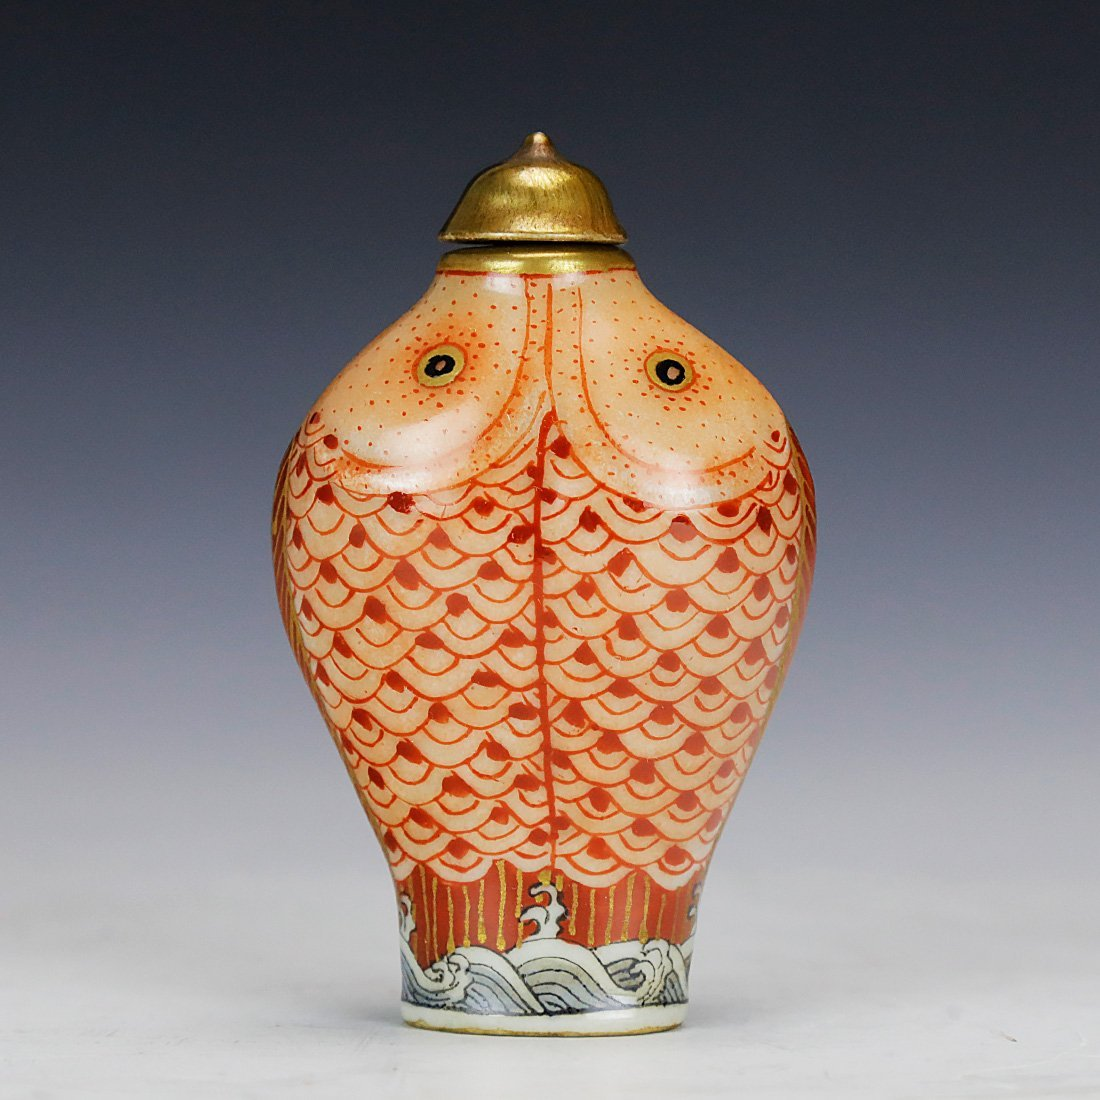 Qianlong ceramic snuff box Hand painted gold 18 century